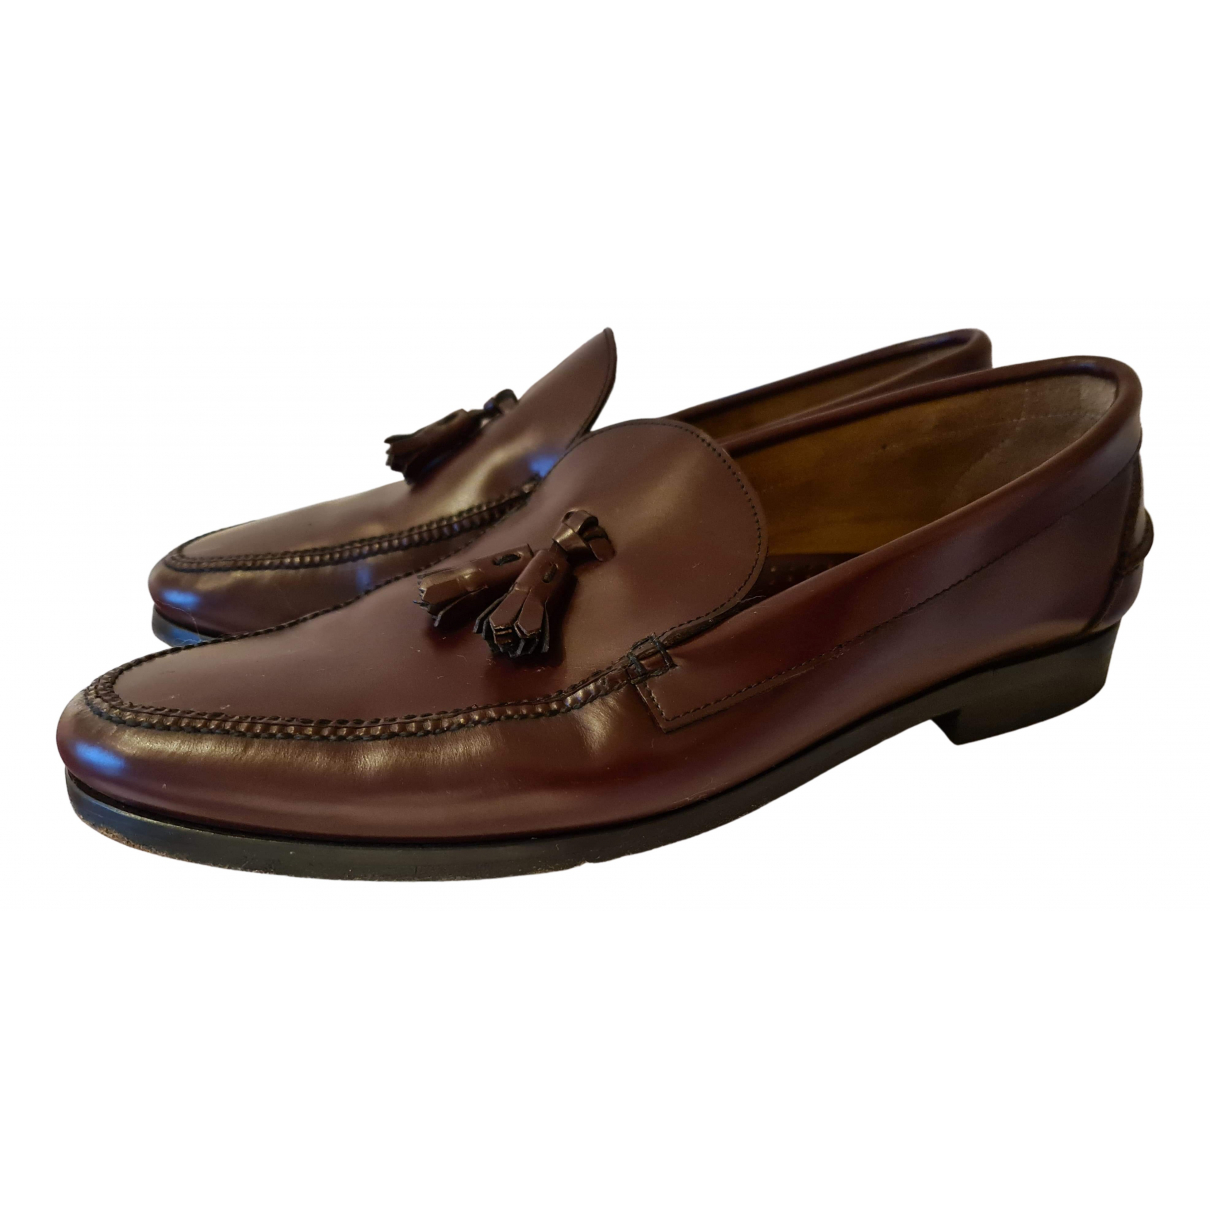 Prada N Brown Leather Flats for Men 43 EU